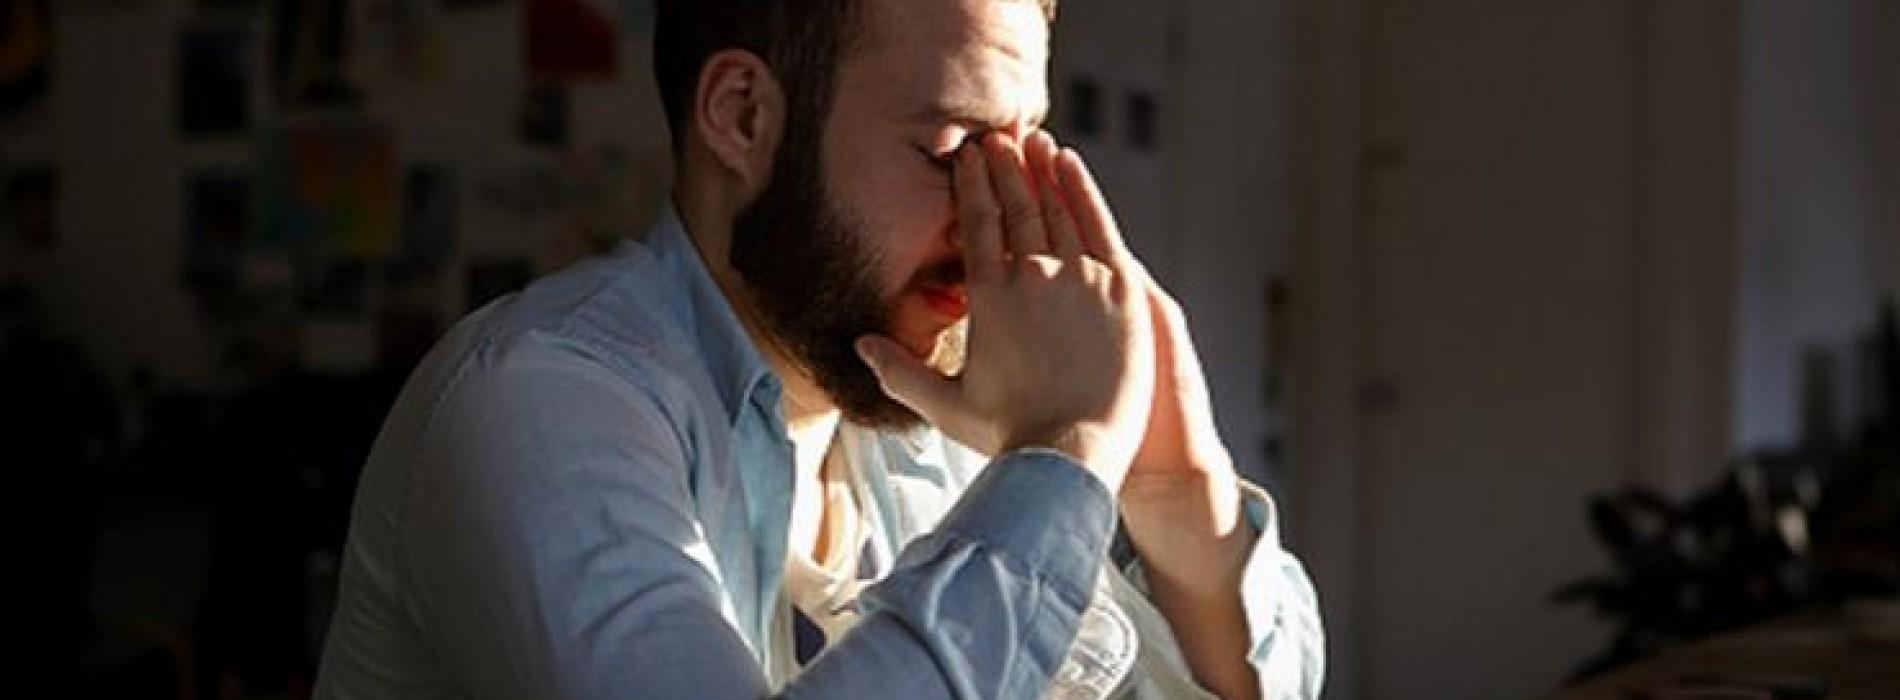 Opiate Withdrawal : Timeline and Symptoms